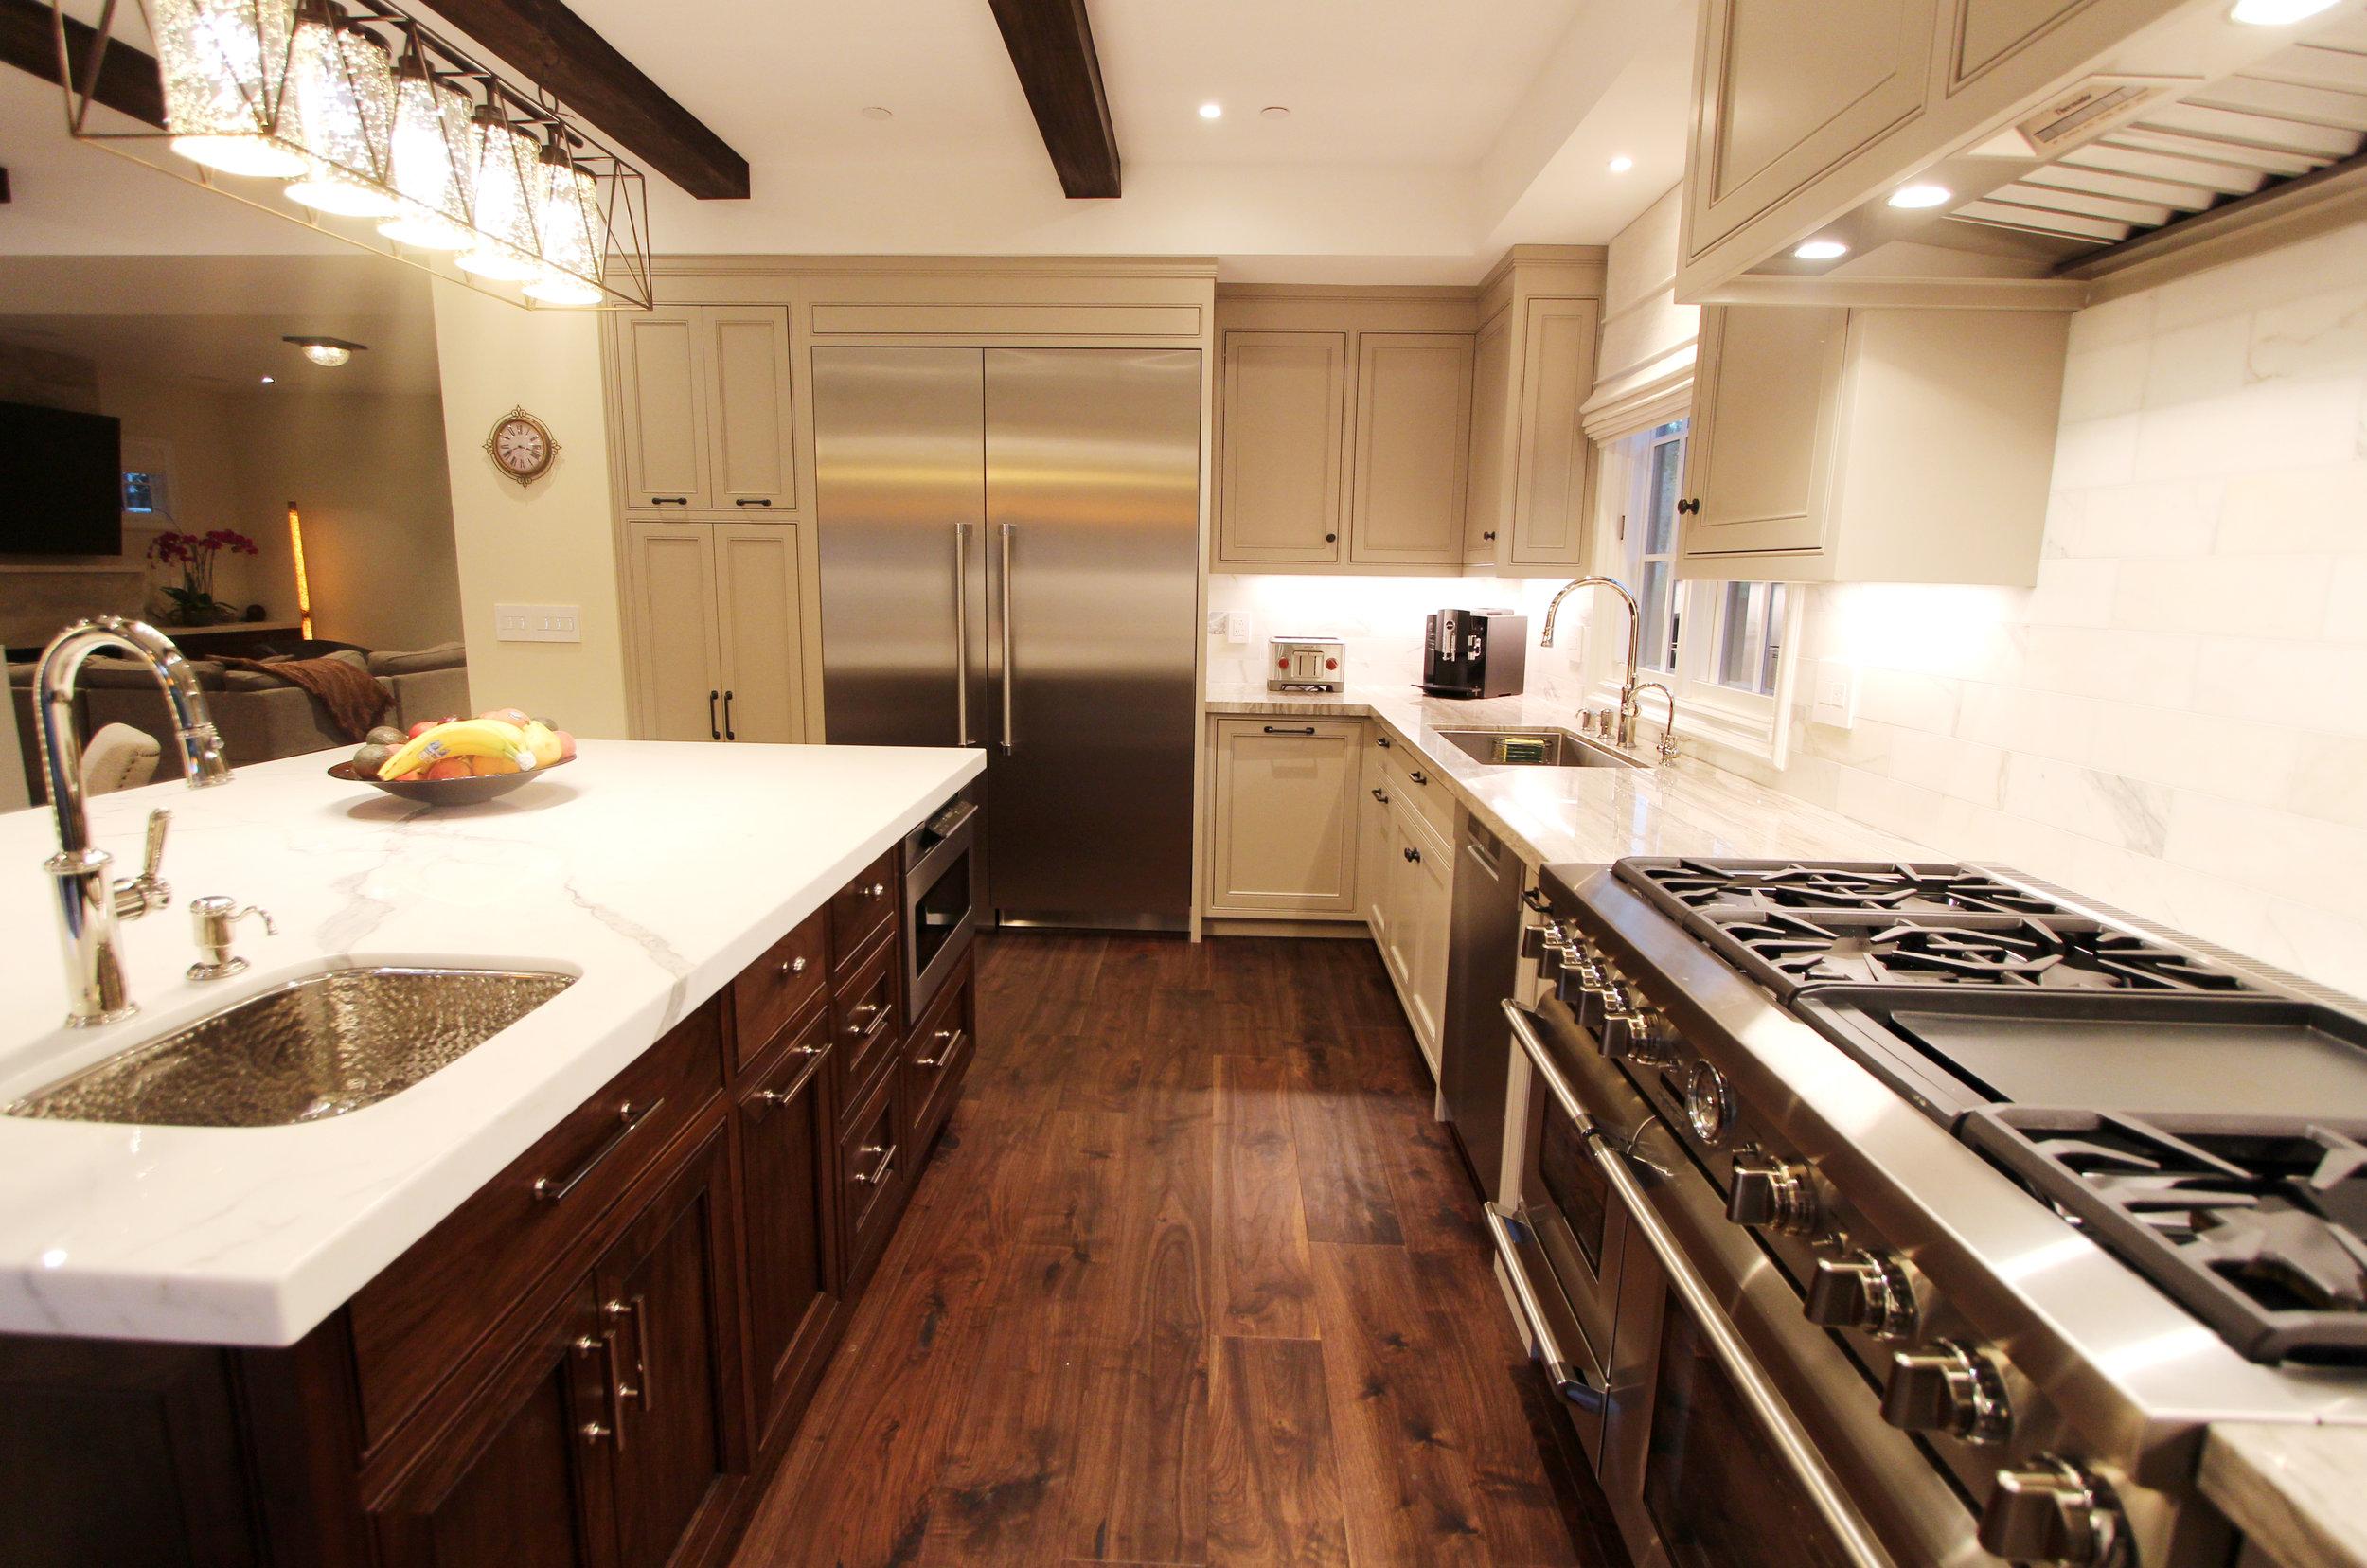 fulton_kitchen_01.jpg